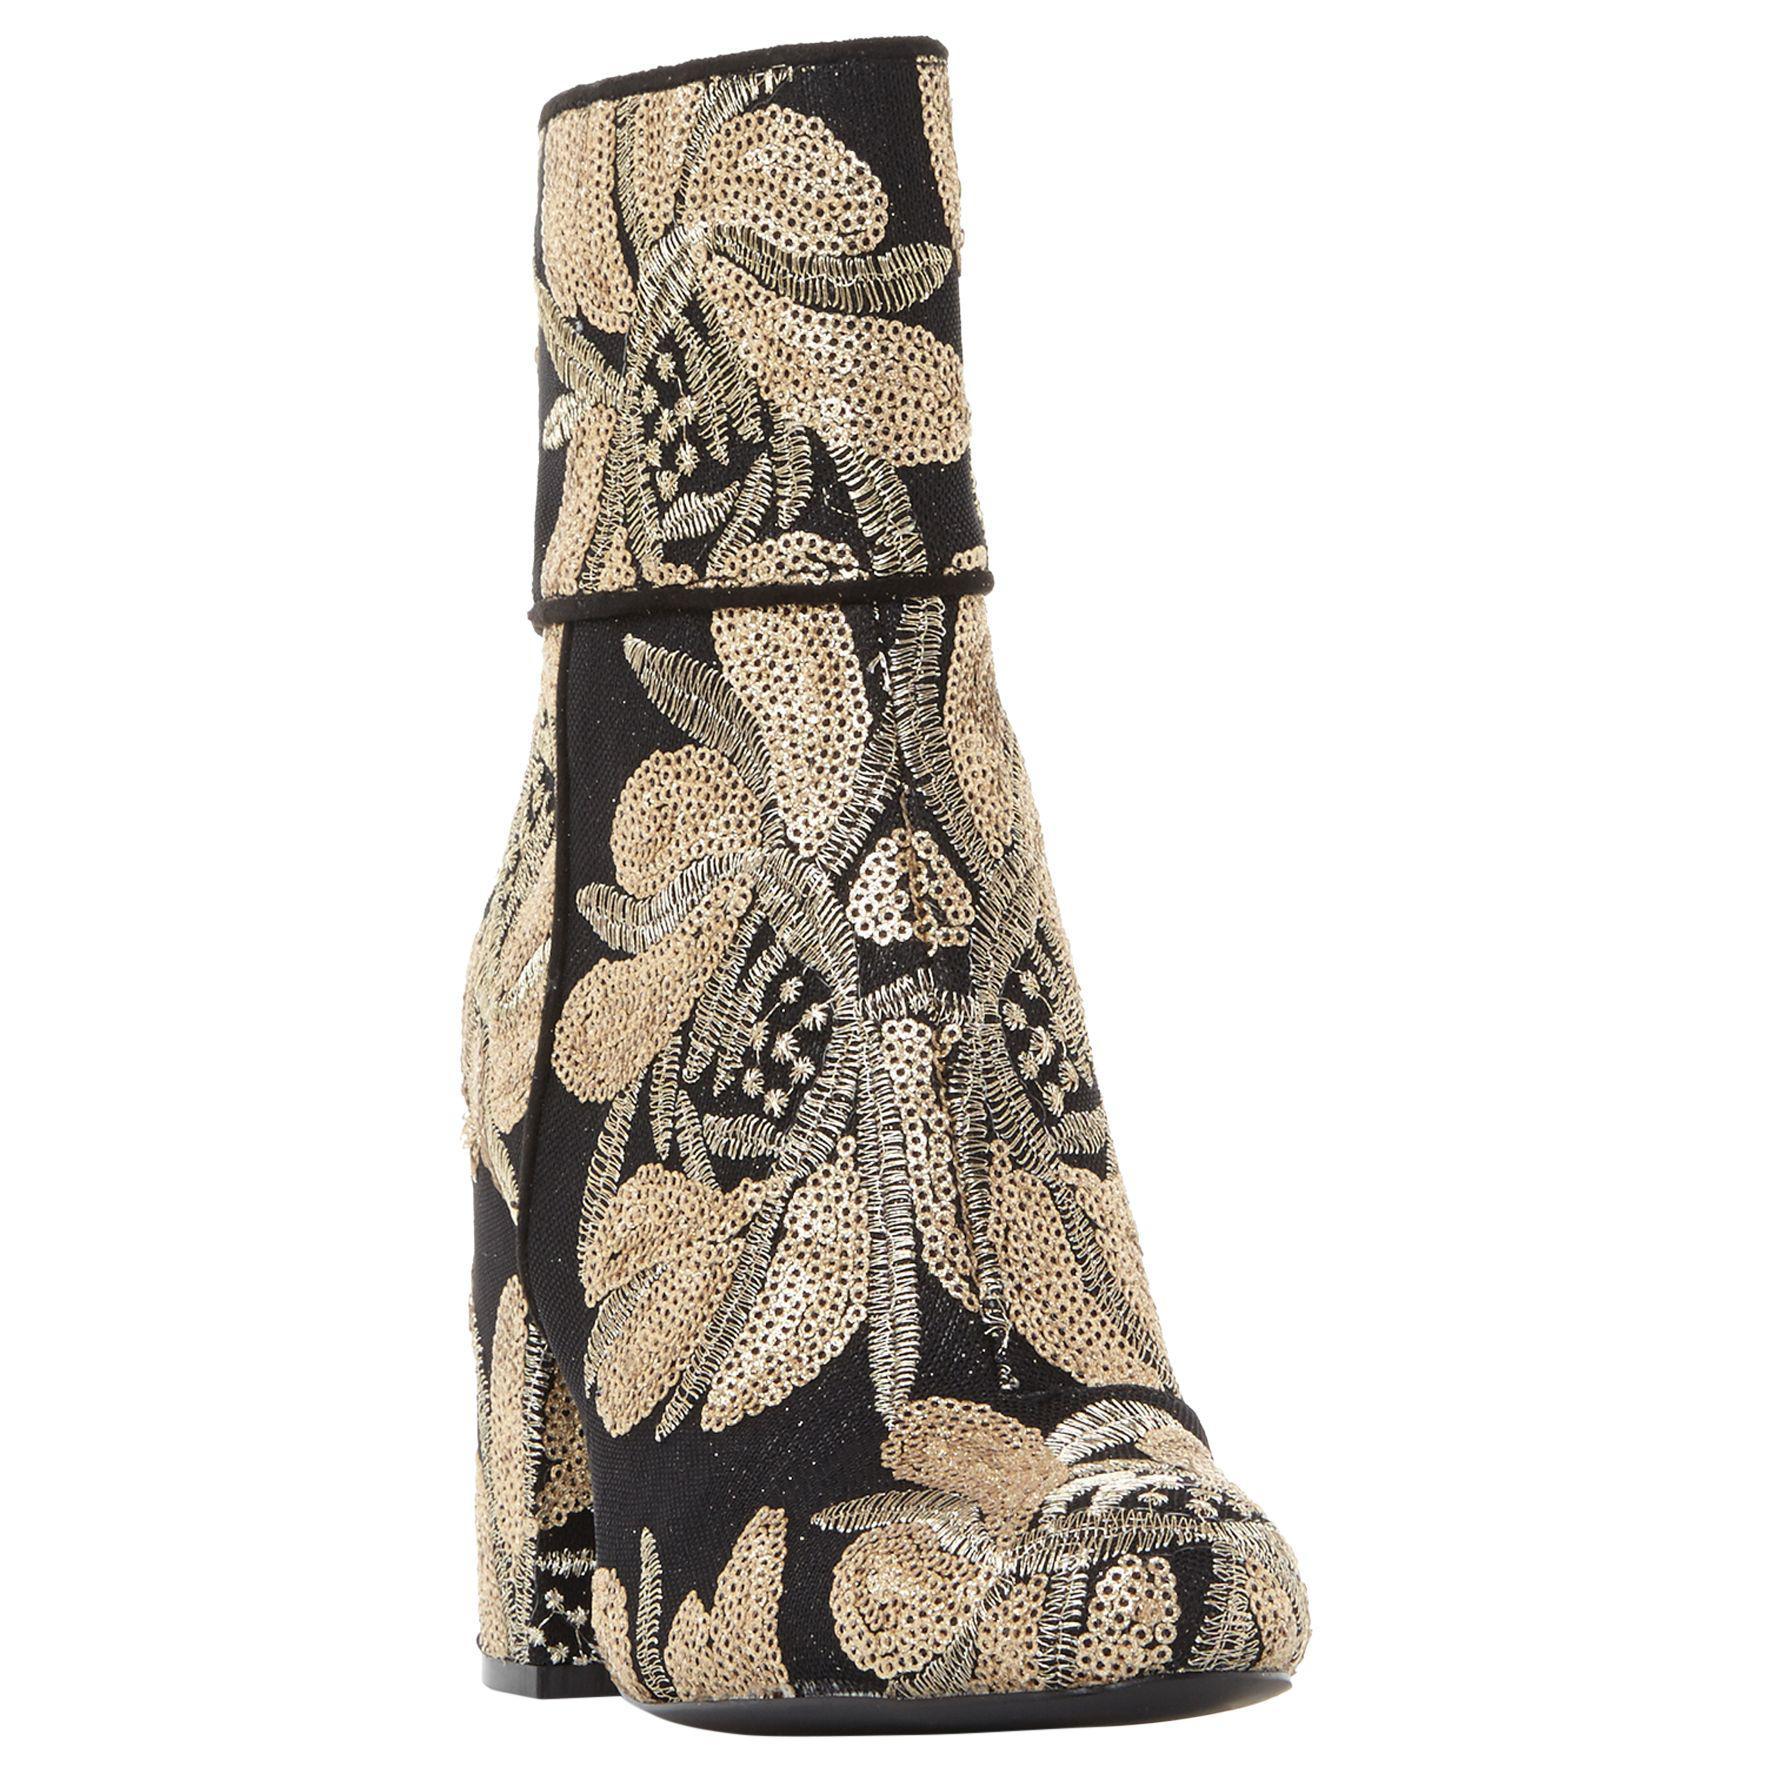 7fd7d7dd7b5 Steve Madden Goldie Embellished Block Heel Ankle Boots - Lyst